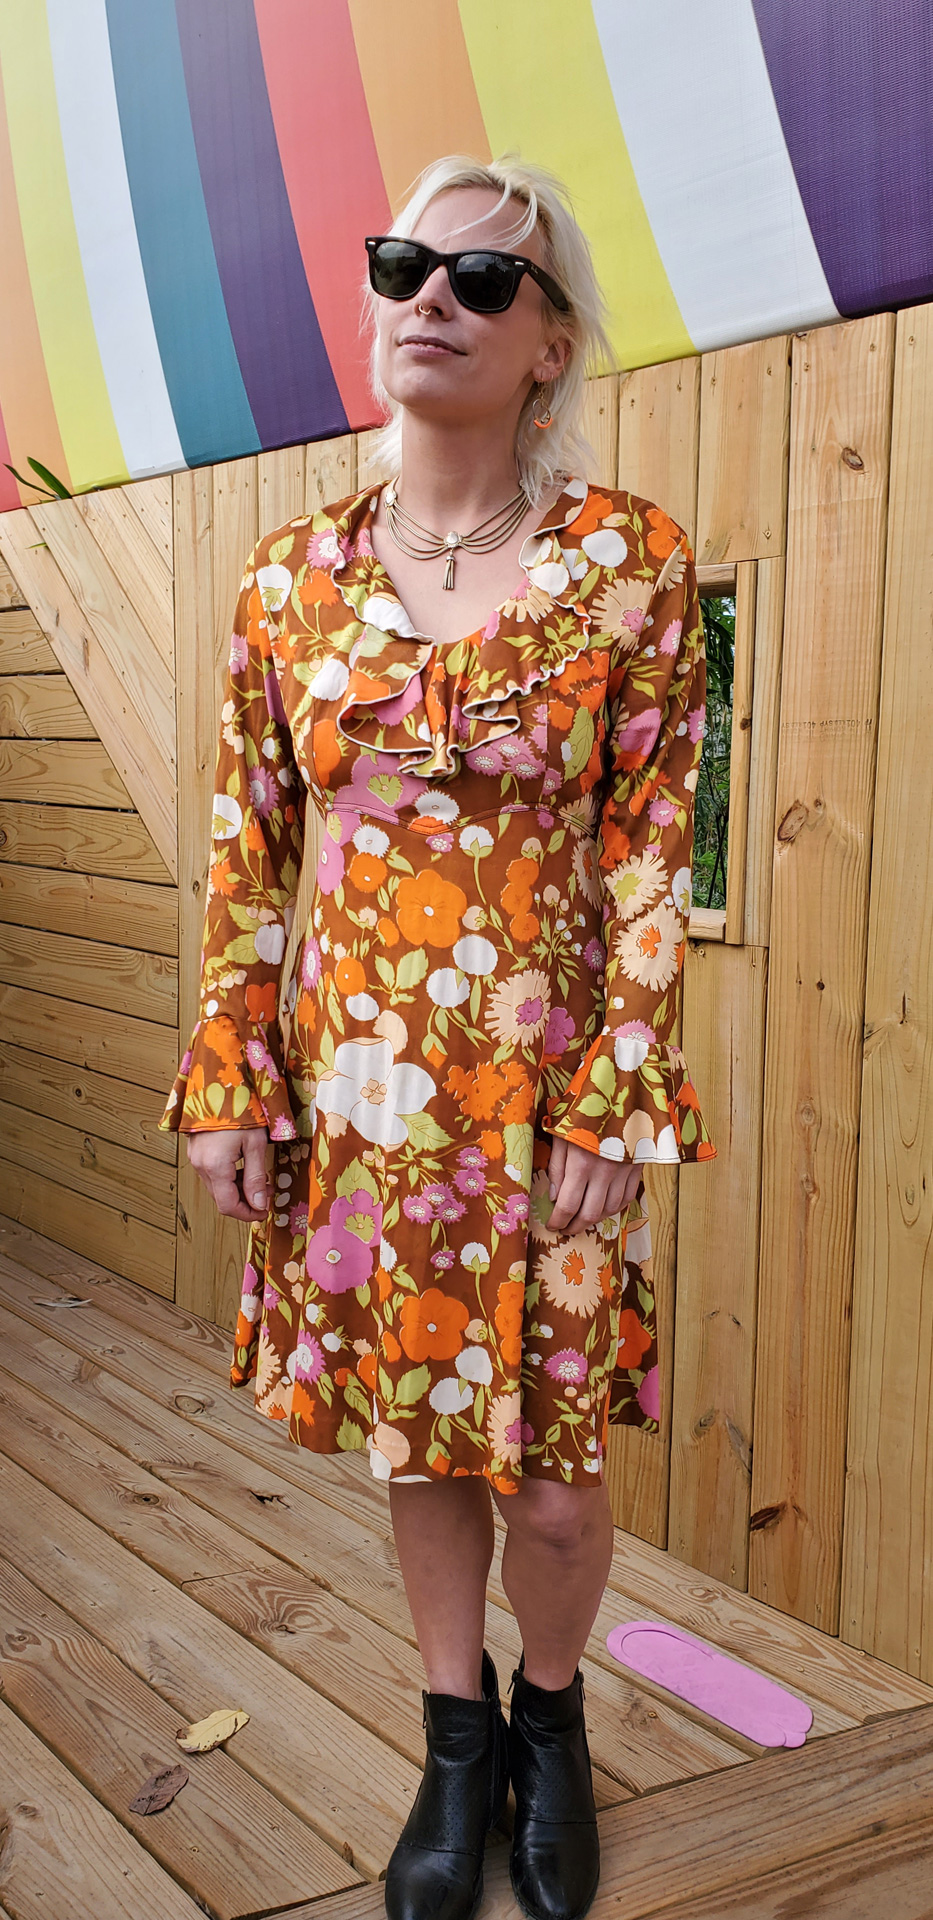 Jess Pottker, artisan apprentice of Sylvia T. Designs. New Orleans, Louisiana.